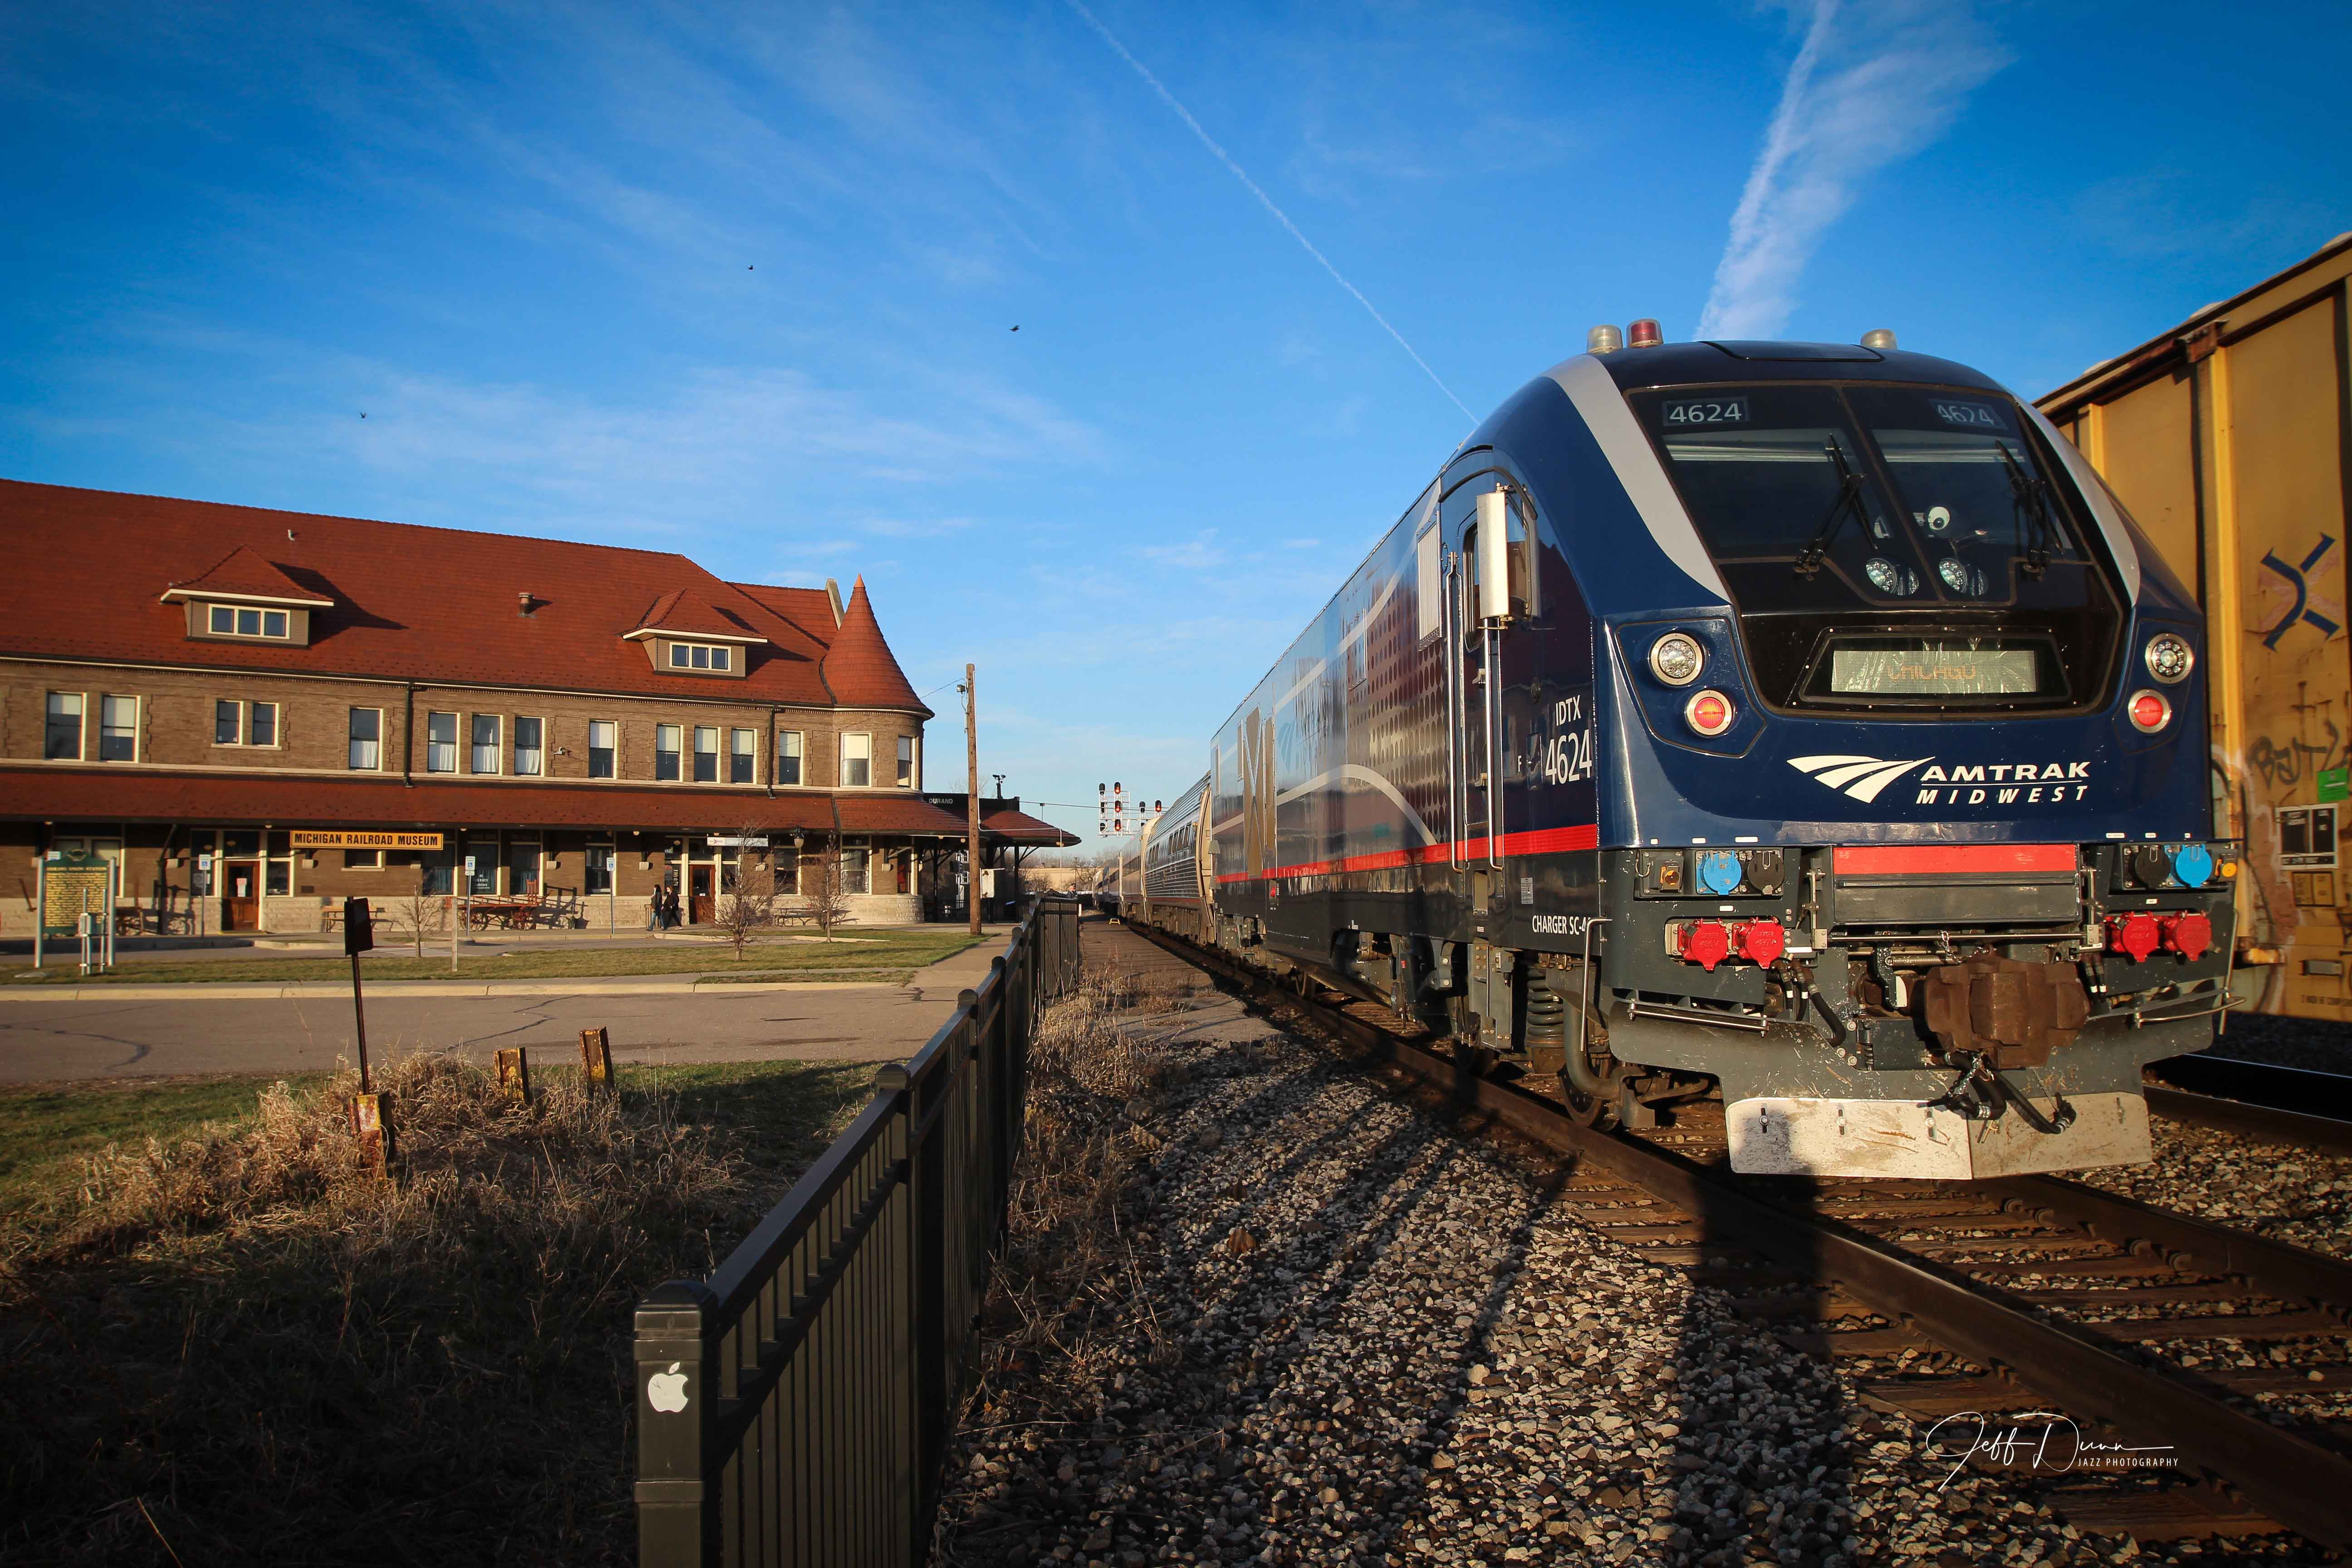 Jeff-Dunn-Durand-Amtrak-Blue-Water-Charger-4624